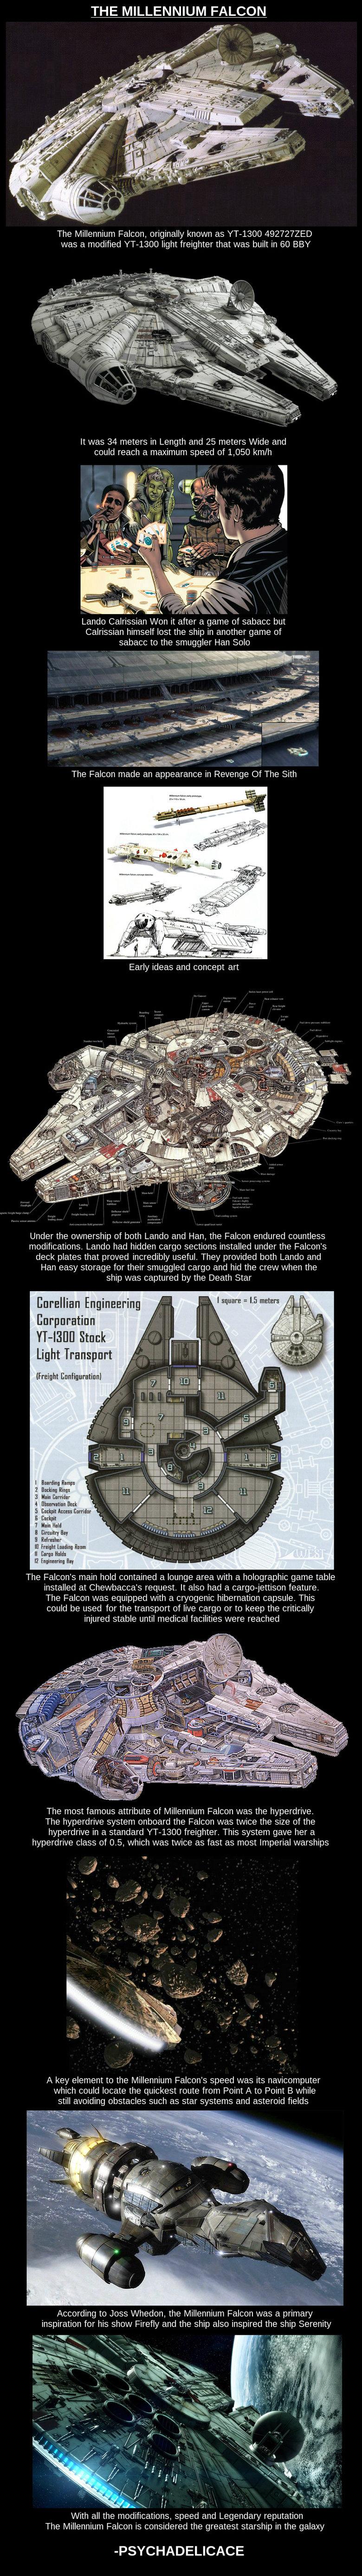 Millennium Falcon. .